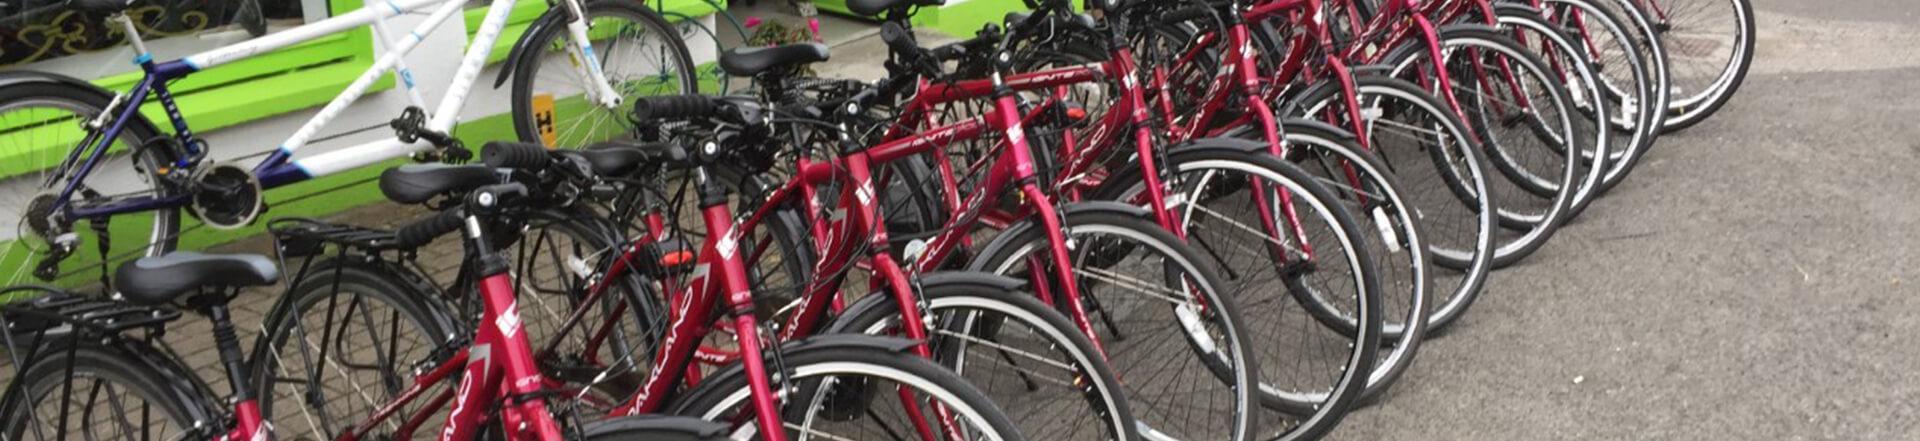 bike hire in Leitrim